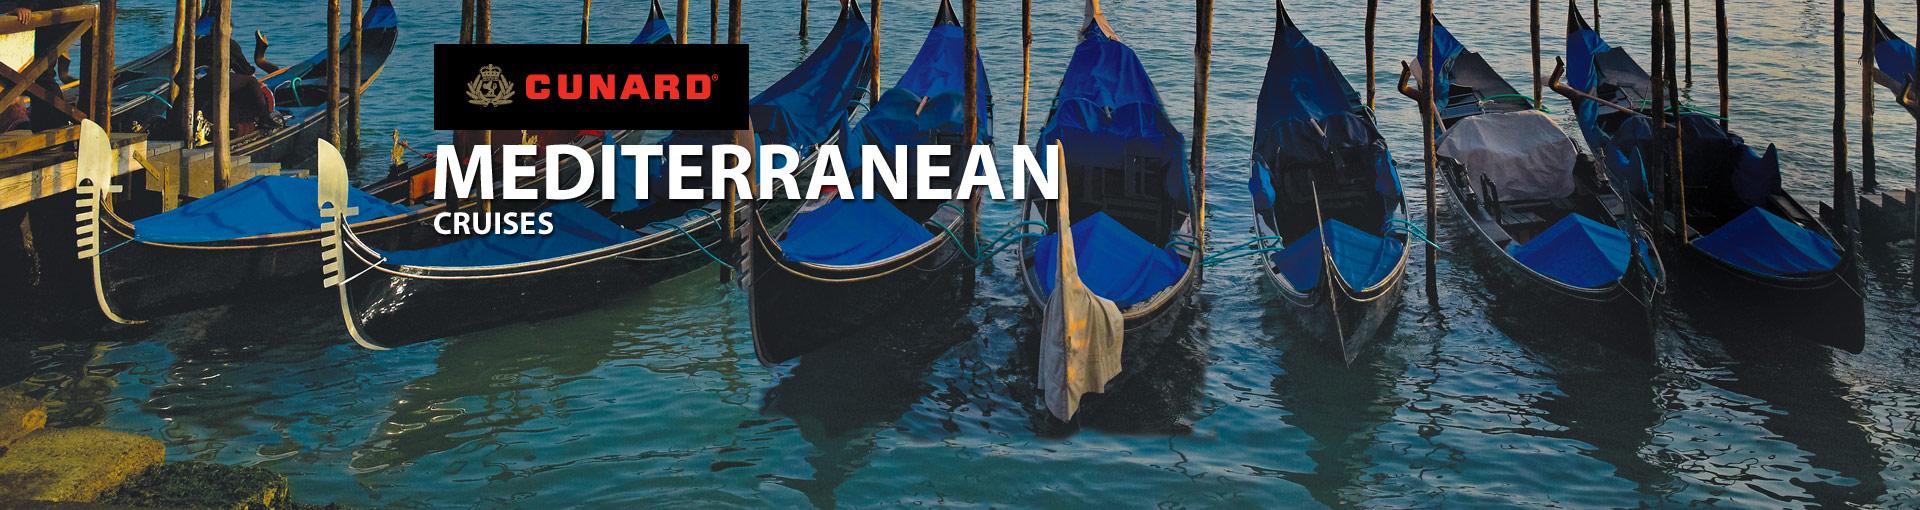 Cunard Line Mediterranean Cruises